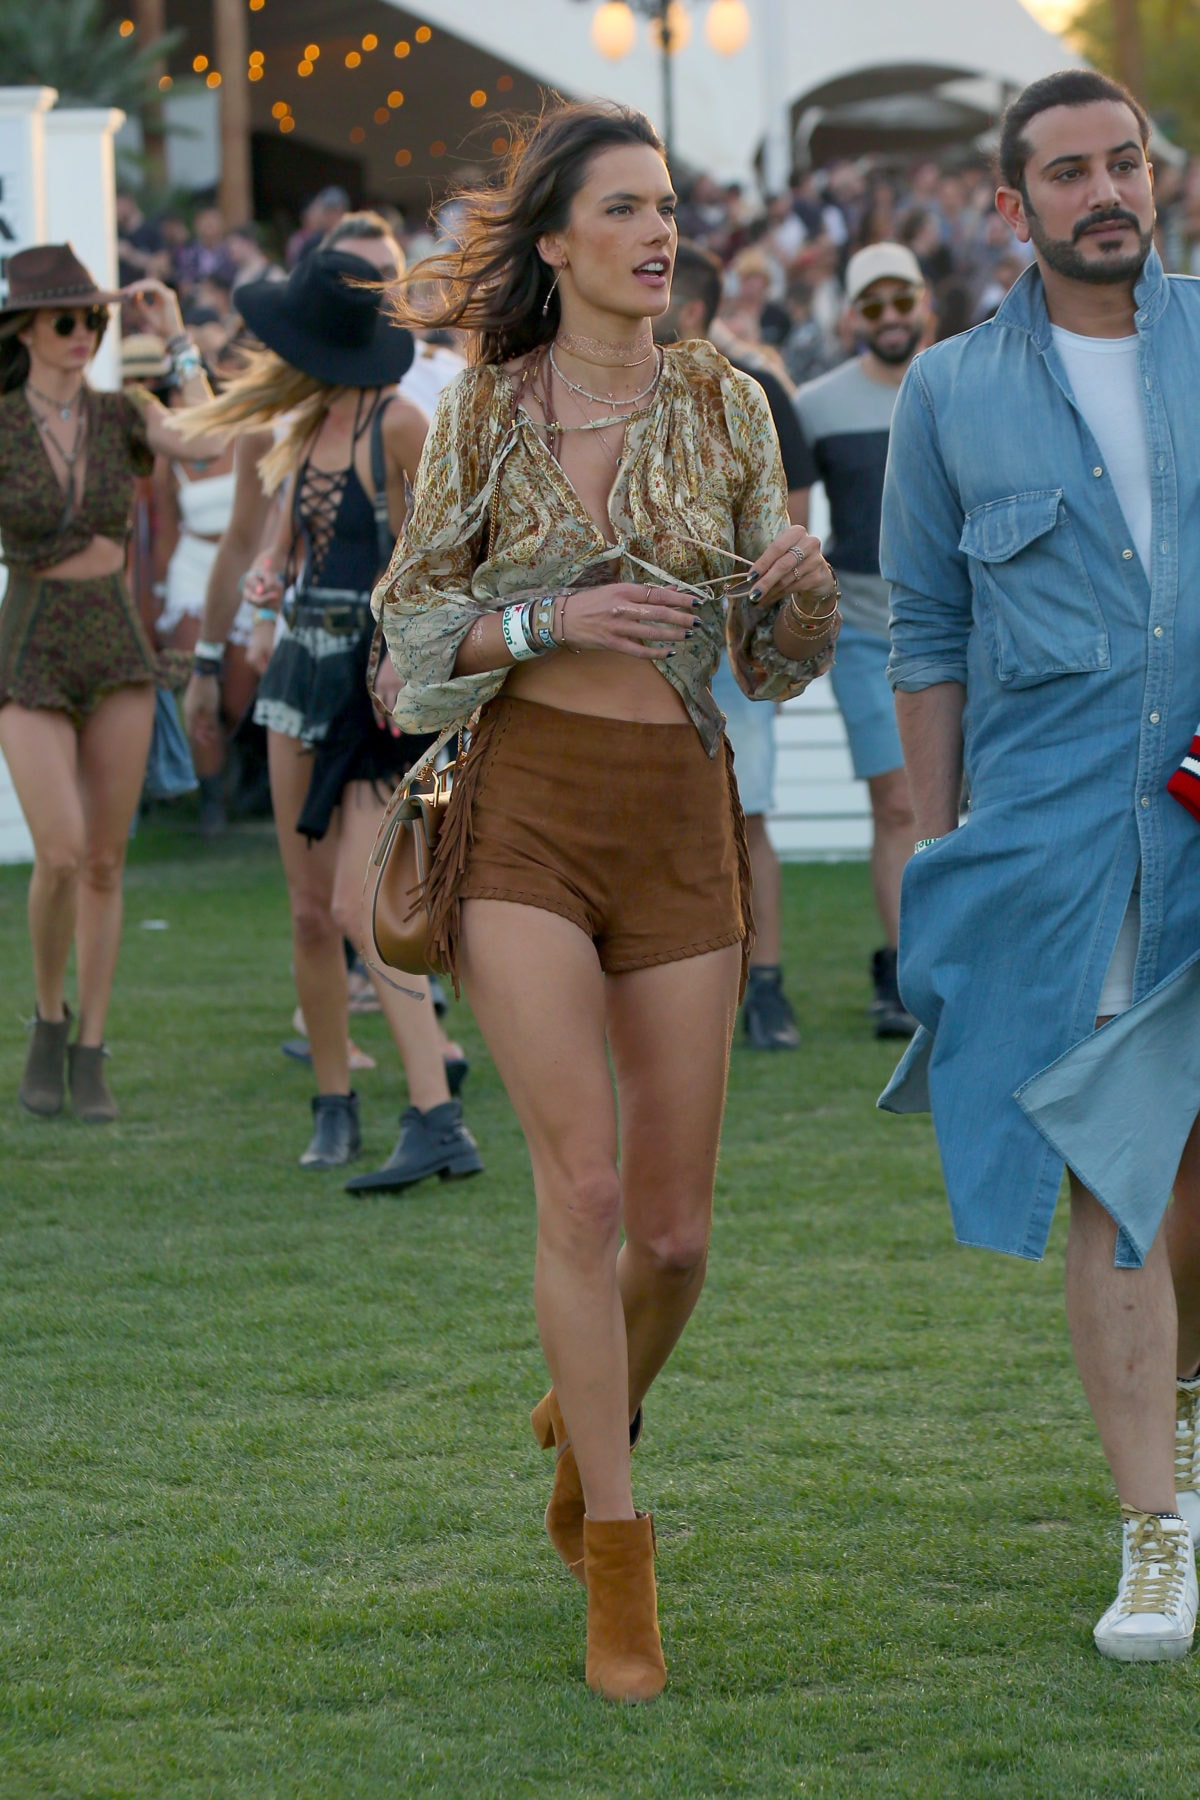 Alessandra Ambrosia displays her long legs at Coachella